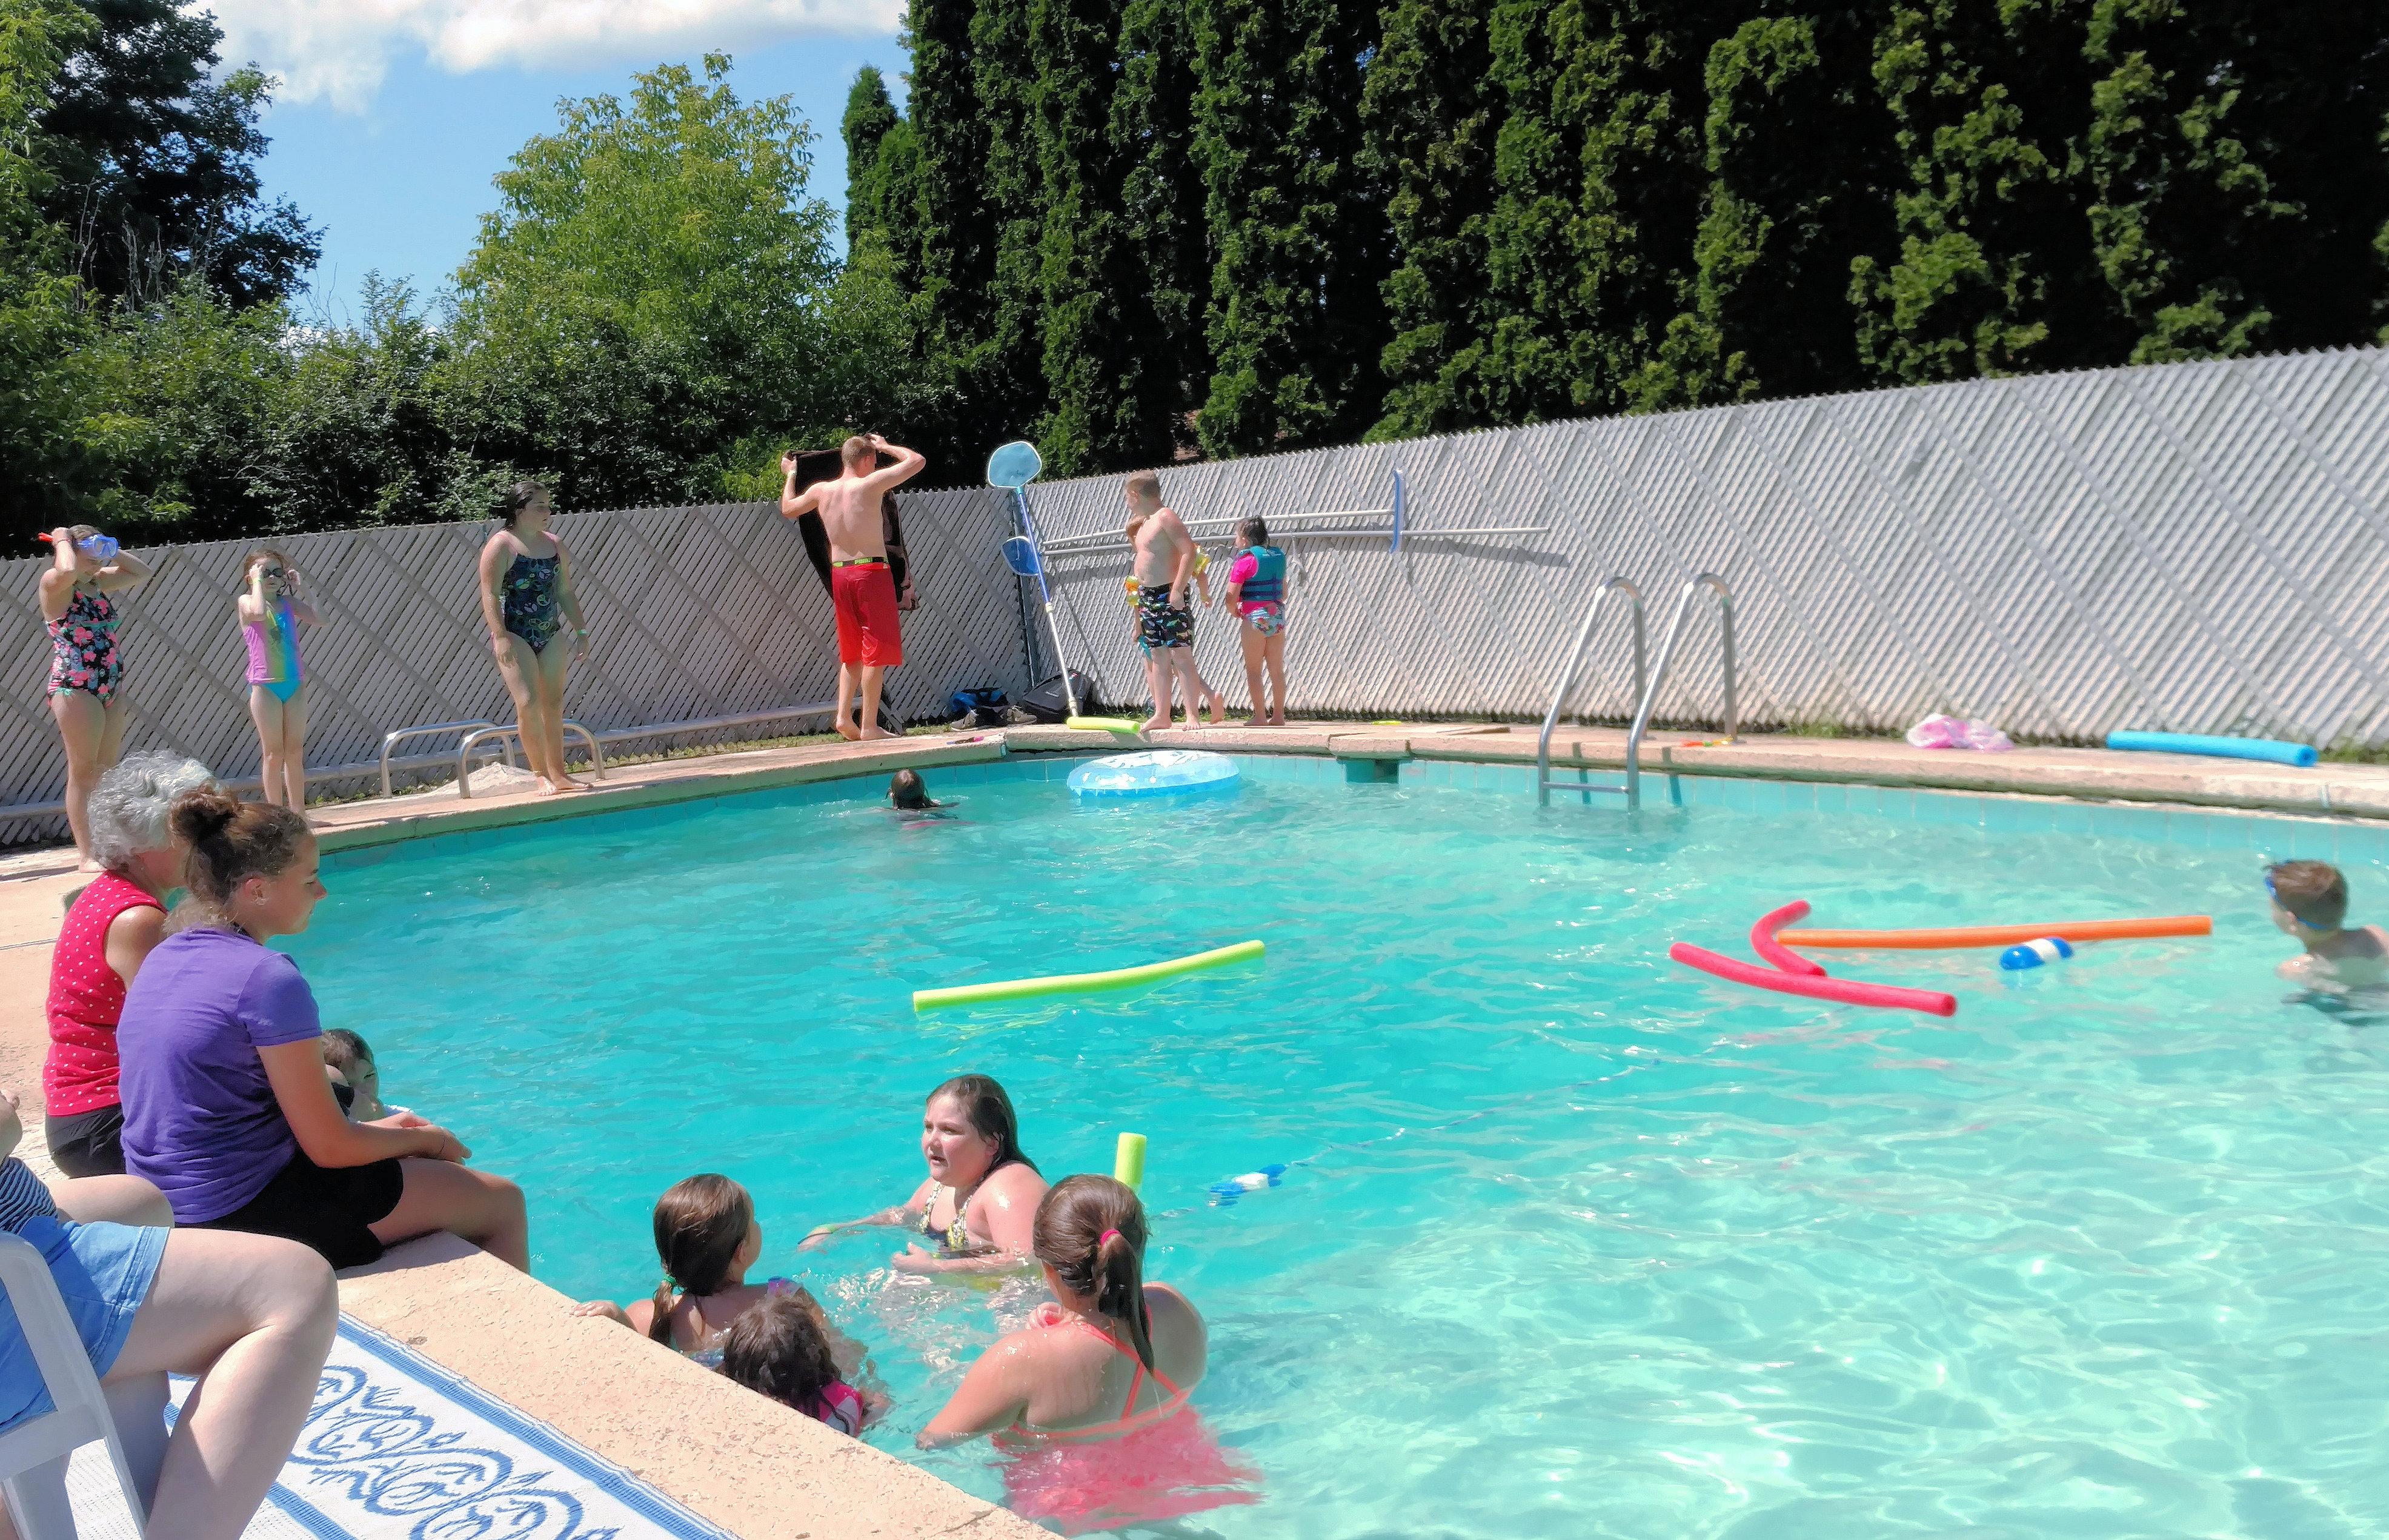 GAP participants enjoy a pool